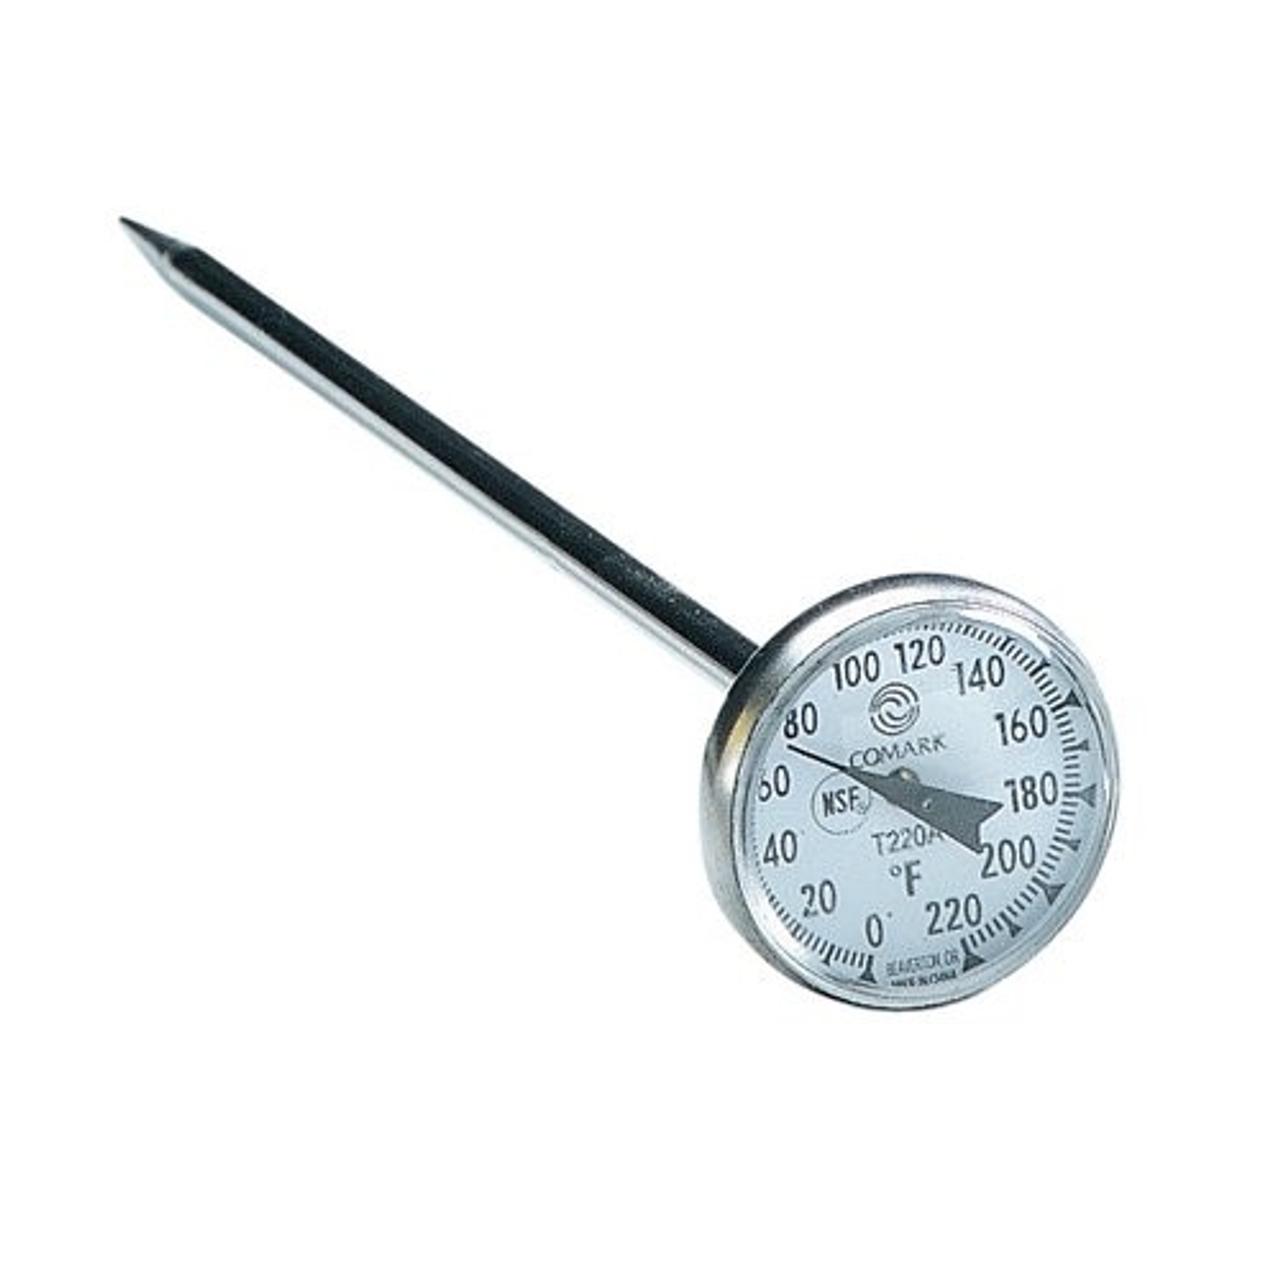 Measuring, Testing & Temp Control